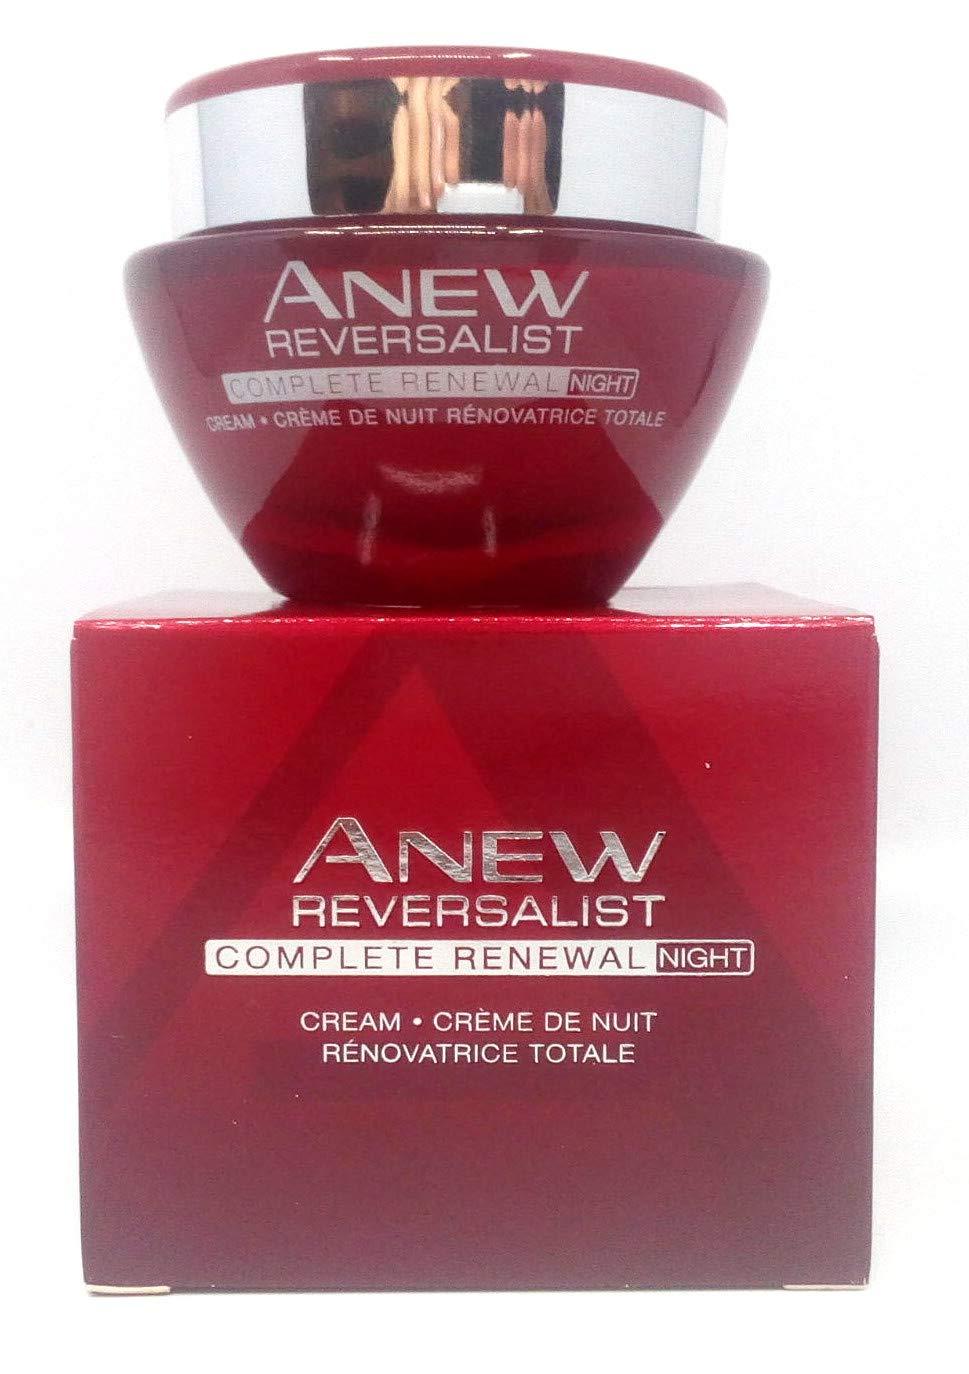 4 x AVON Anew Reversalist Complete Renewal Night Cream 50ml – 1.7oz SET